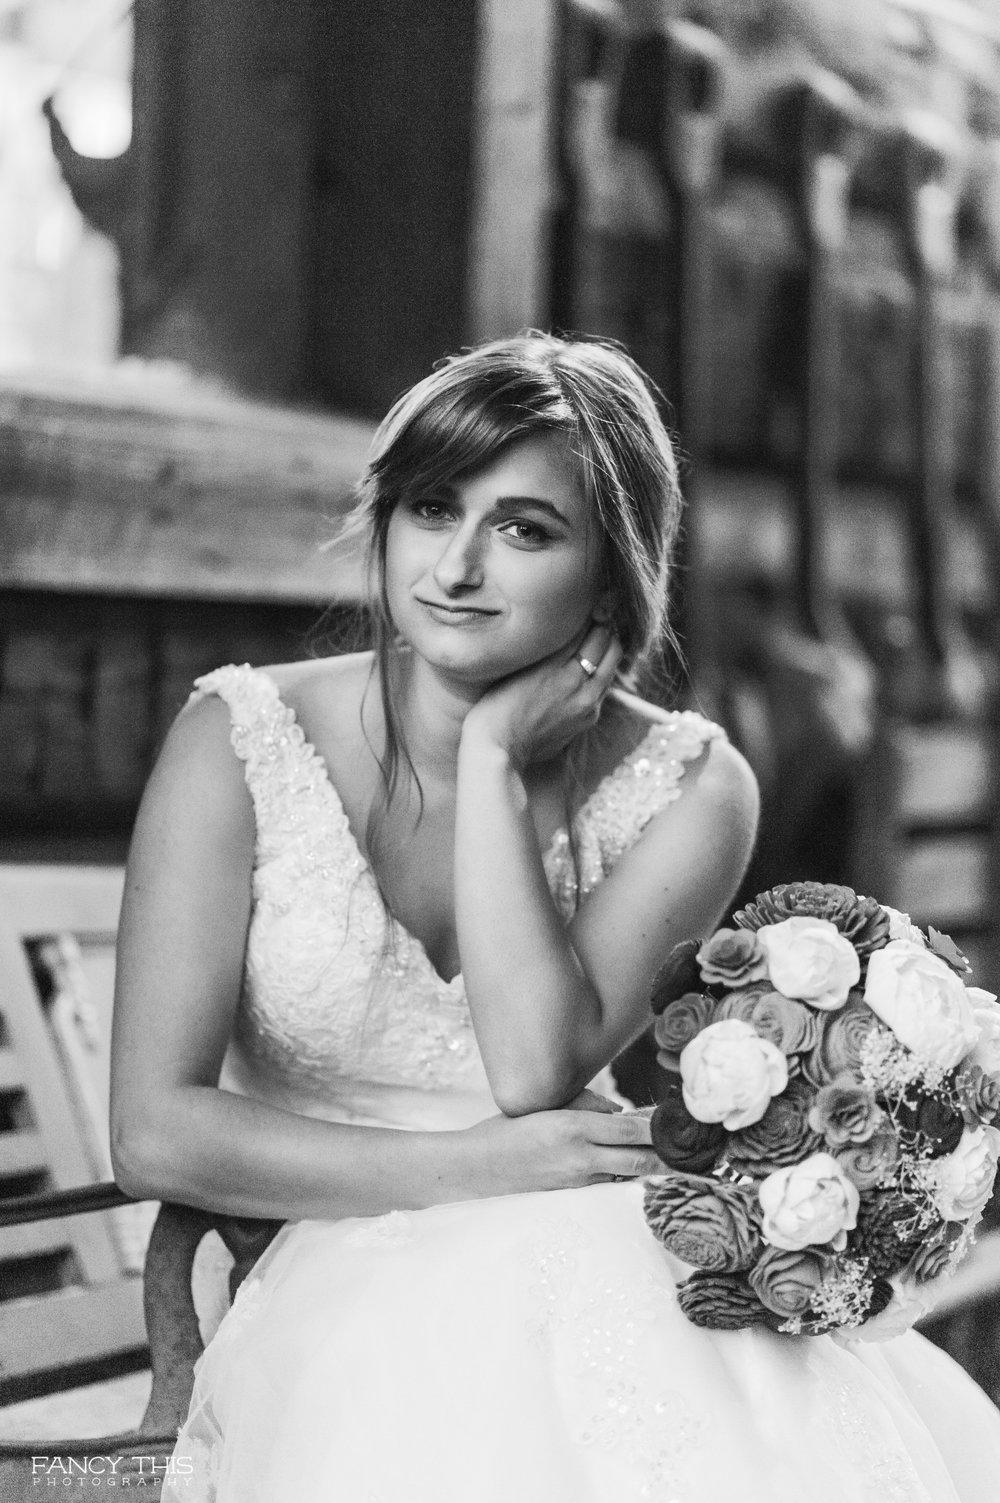 carolsimchik_bridals_socialmediaready-73.jpg